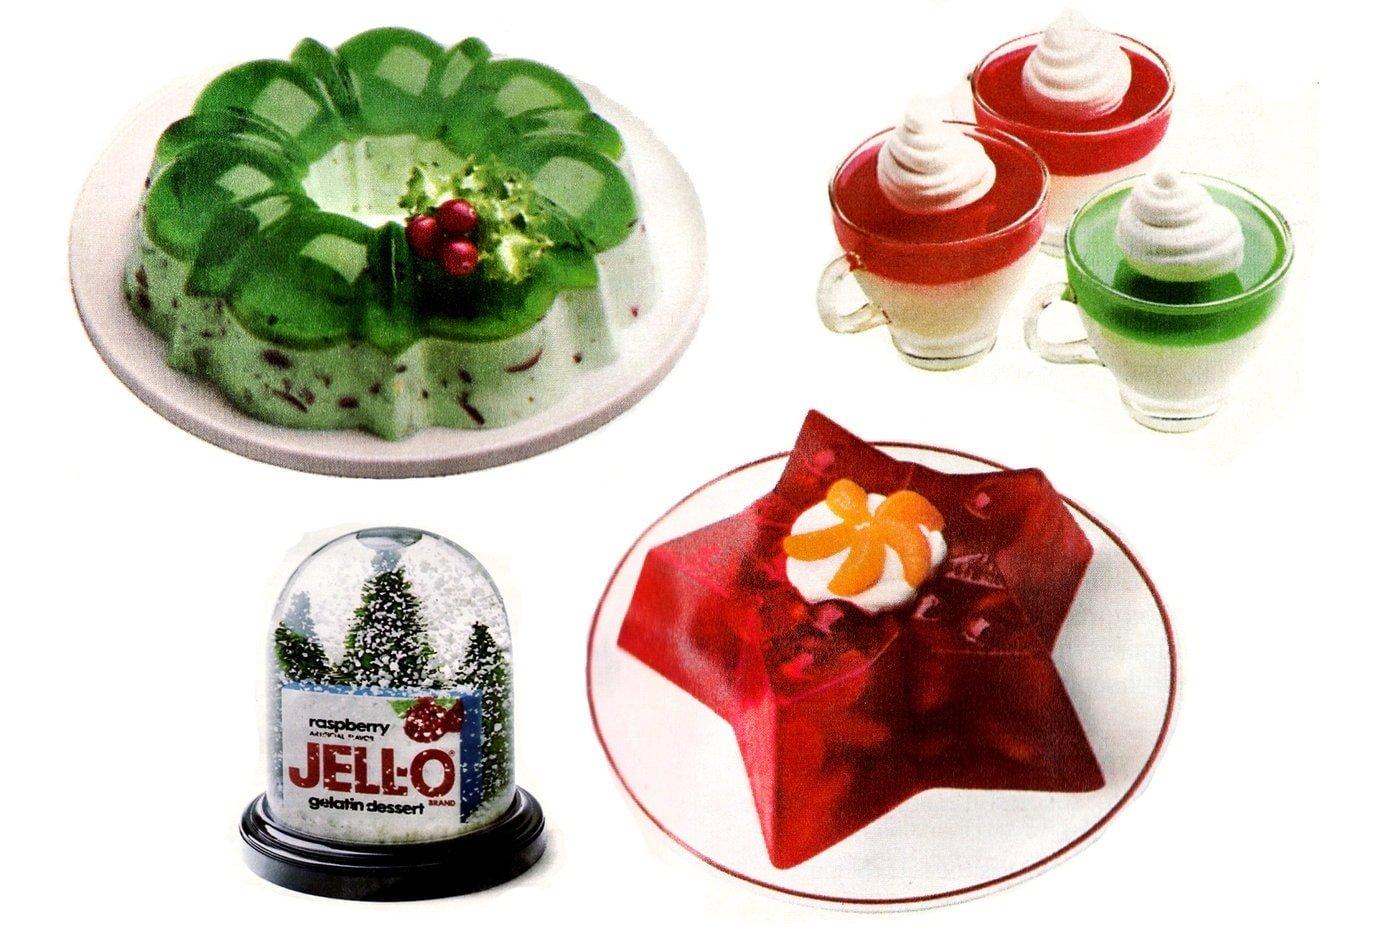 Retro Christmas Jello desserts from 1985